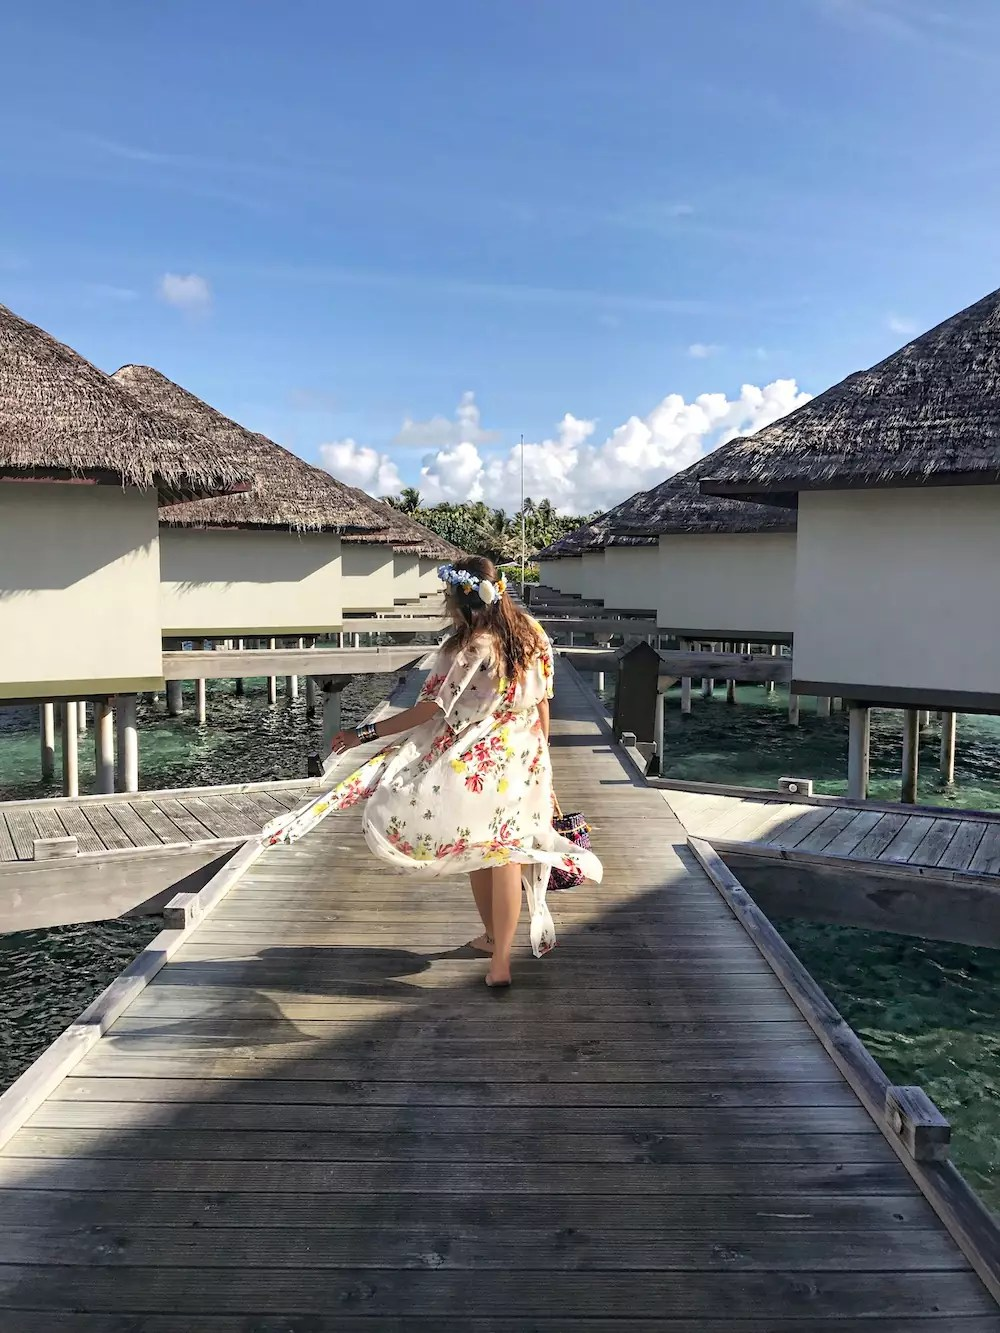 the-most-beautiful-my-baby-bump-photos-alley-girl-fashion-new-york-technology-betul-yildiz-maldives